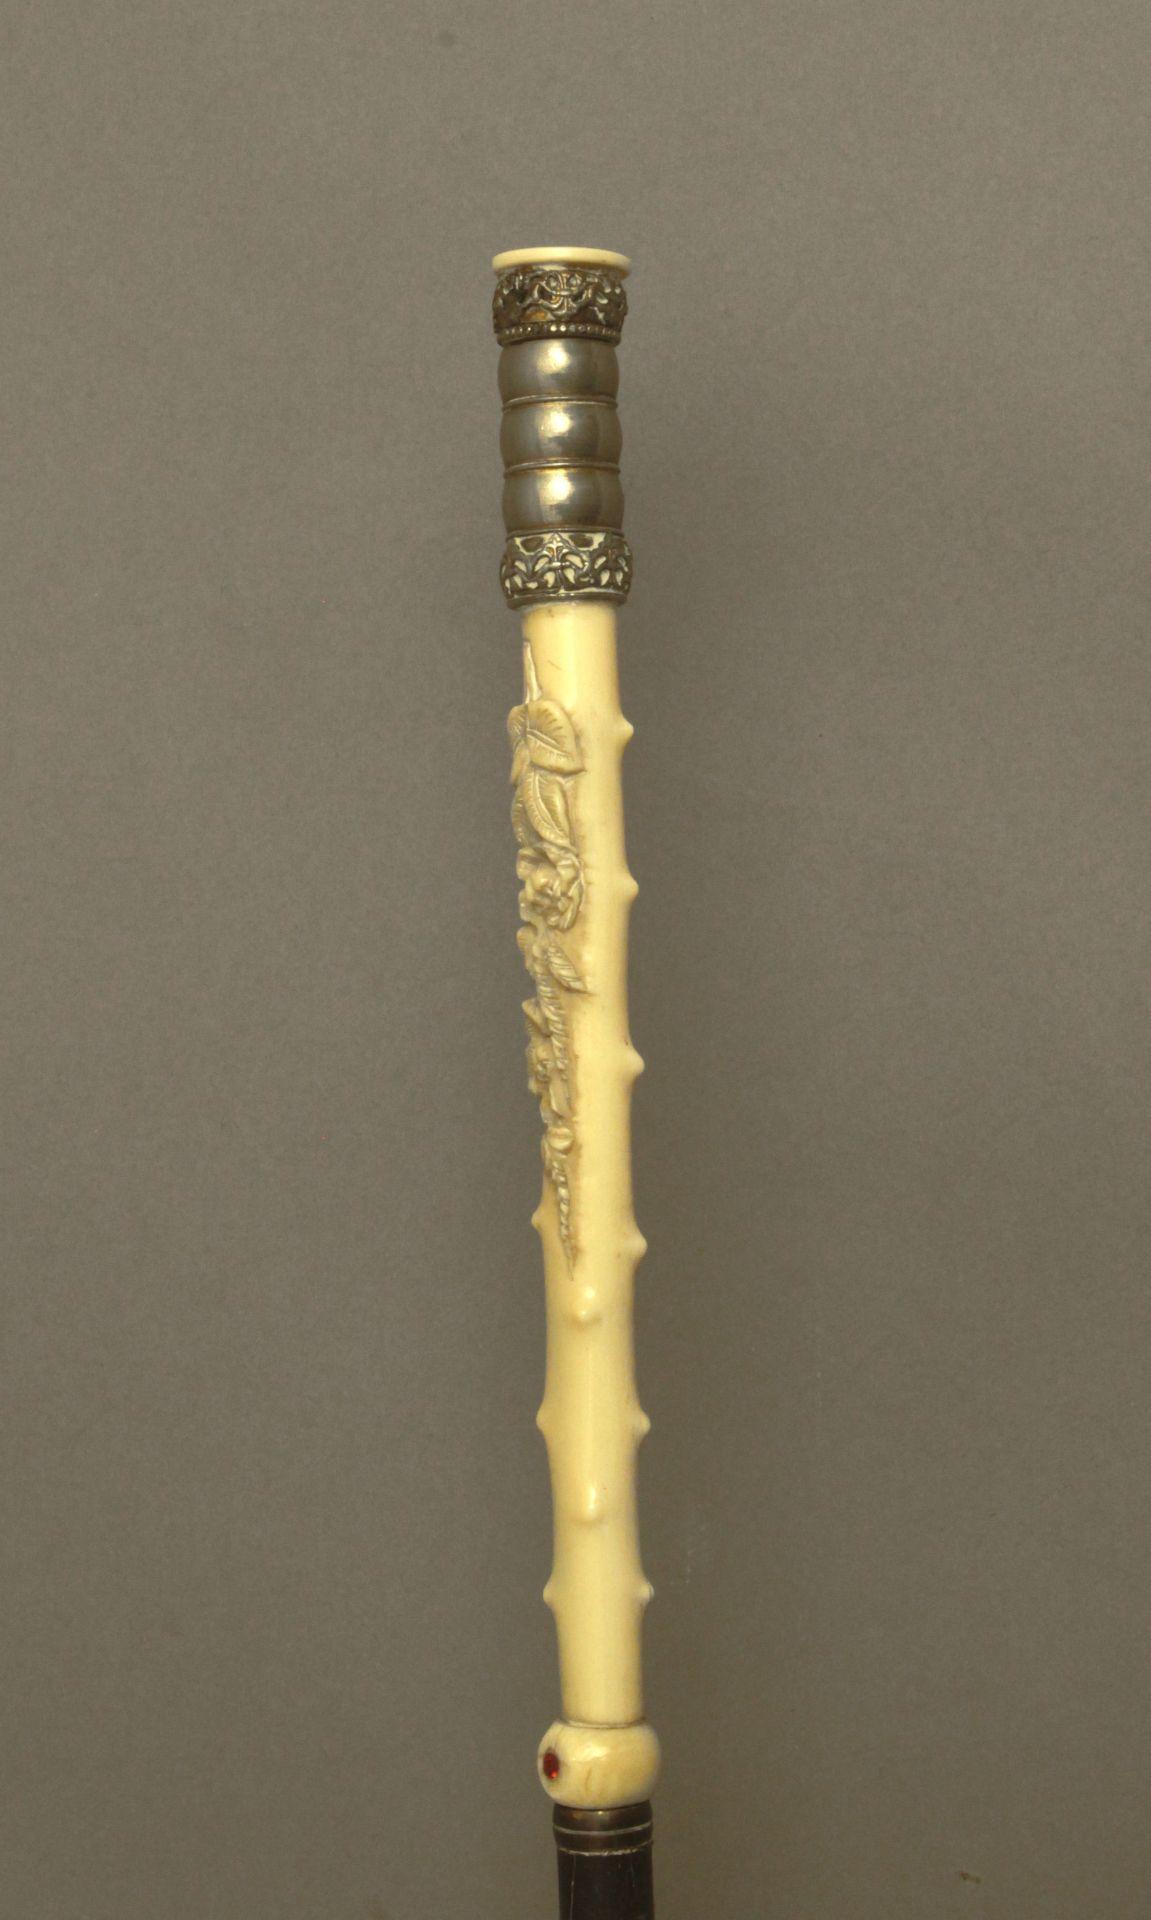 An ivory handled walking stick circa 1900 - Bild 2 aus 9